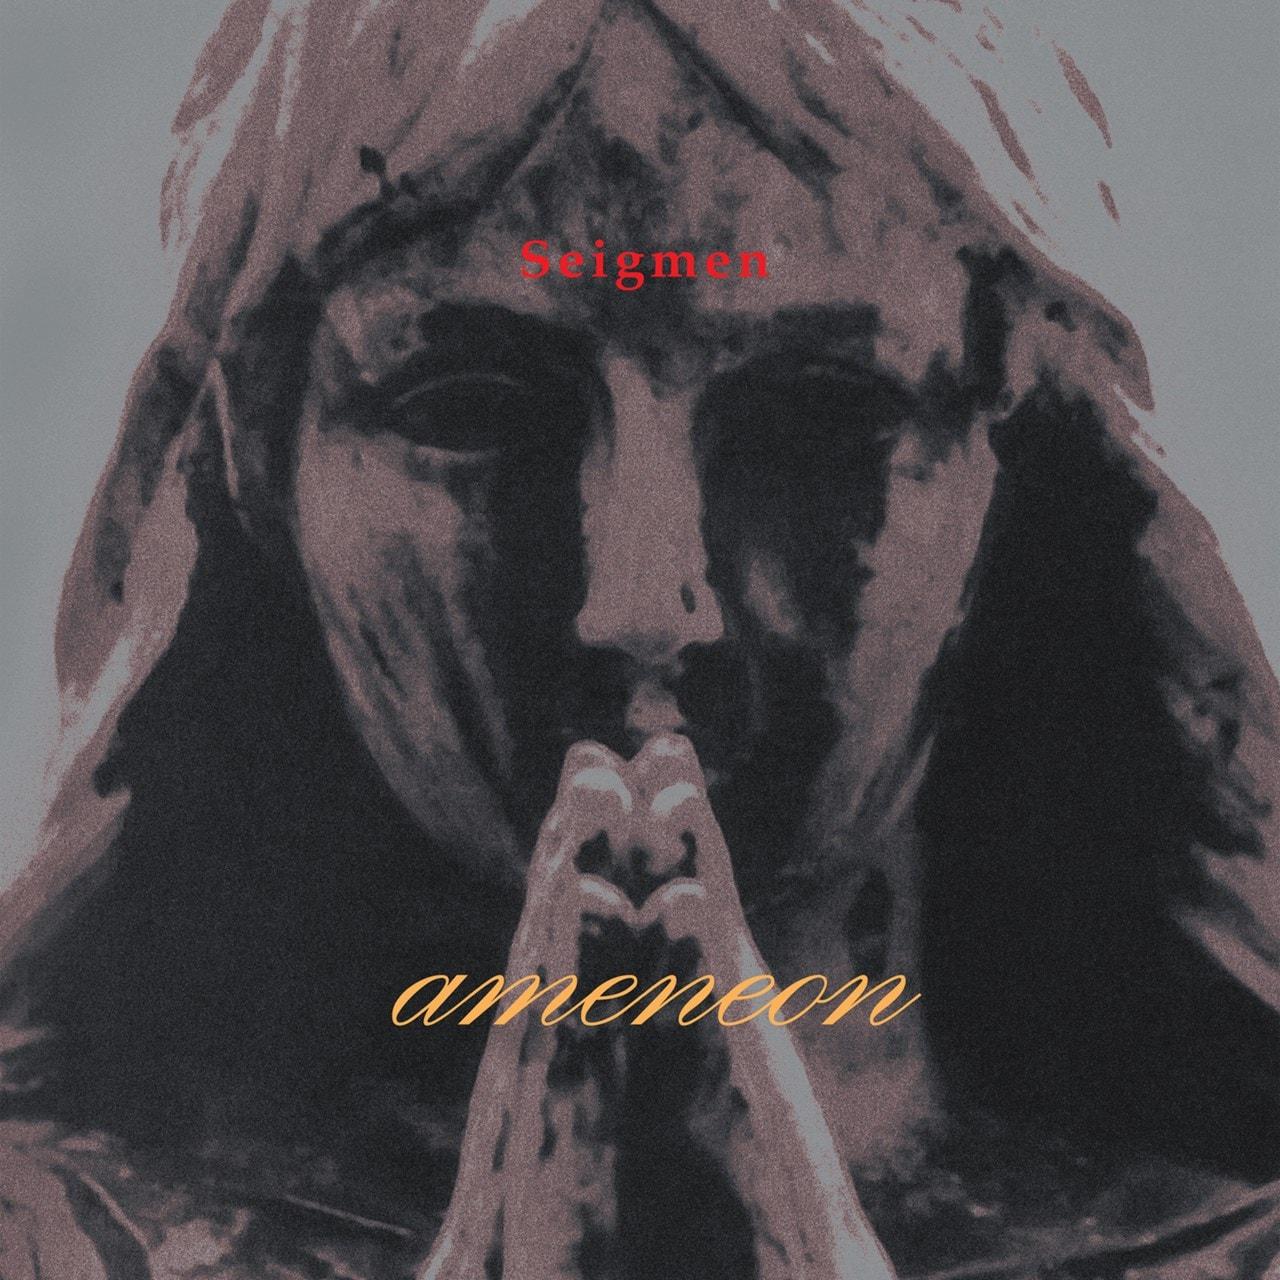 Ameneon - 1